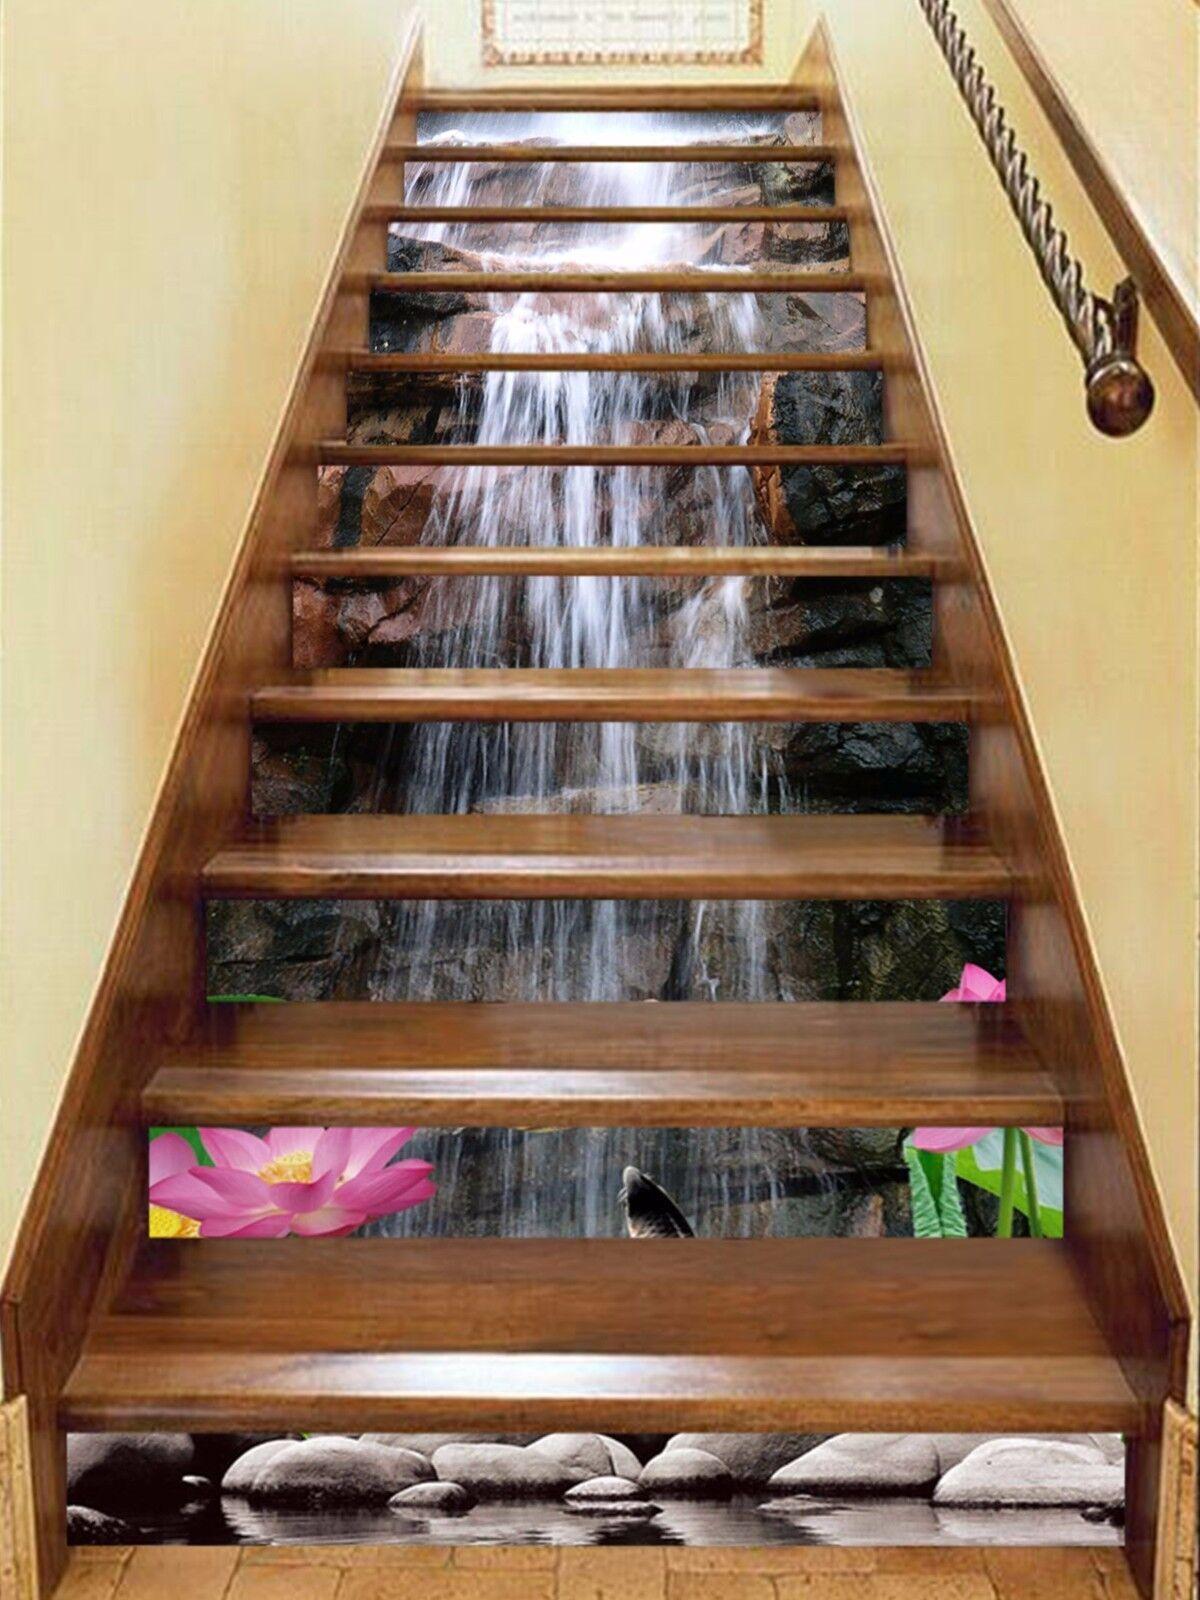 3D Flowers Falls 85 Stair Risers Decoration Mural Vinyl Decal